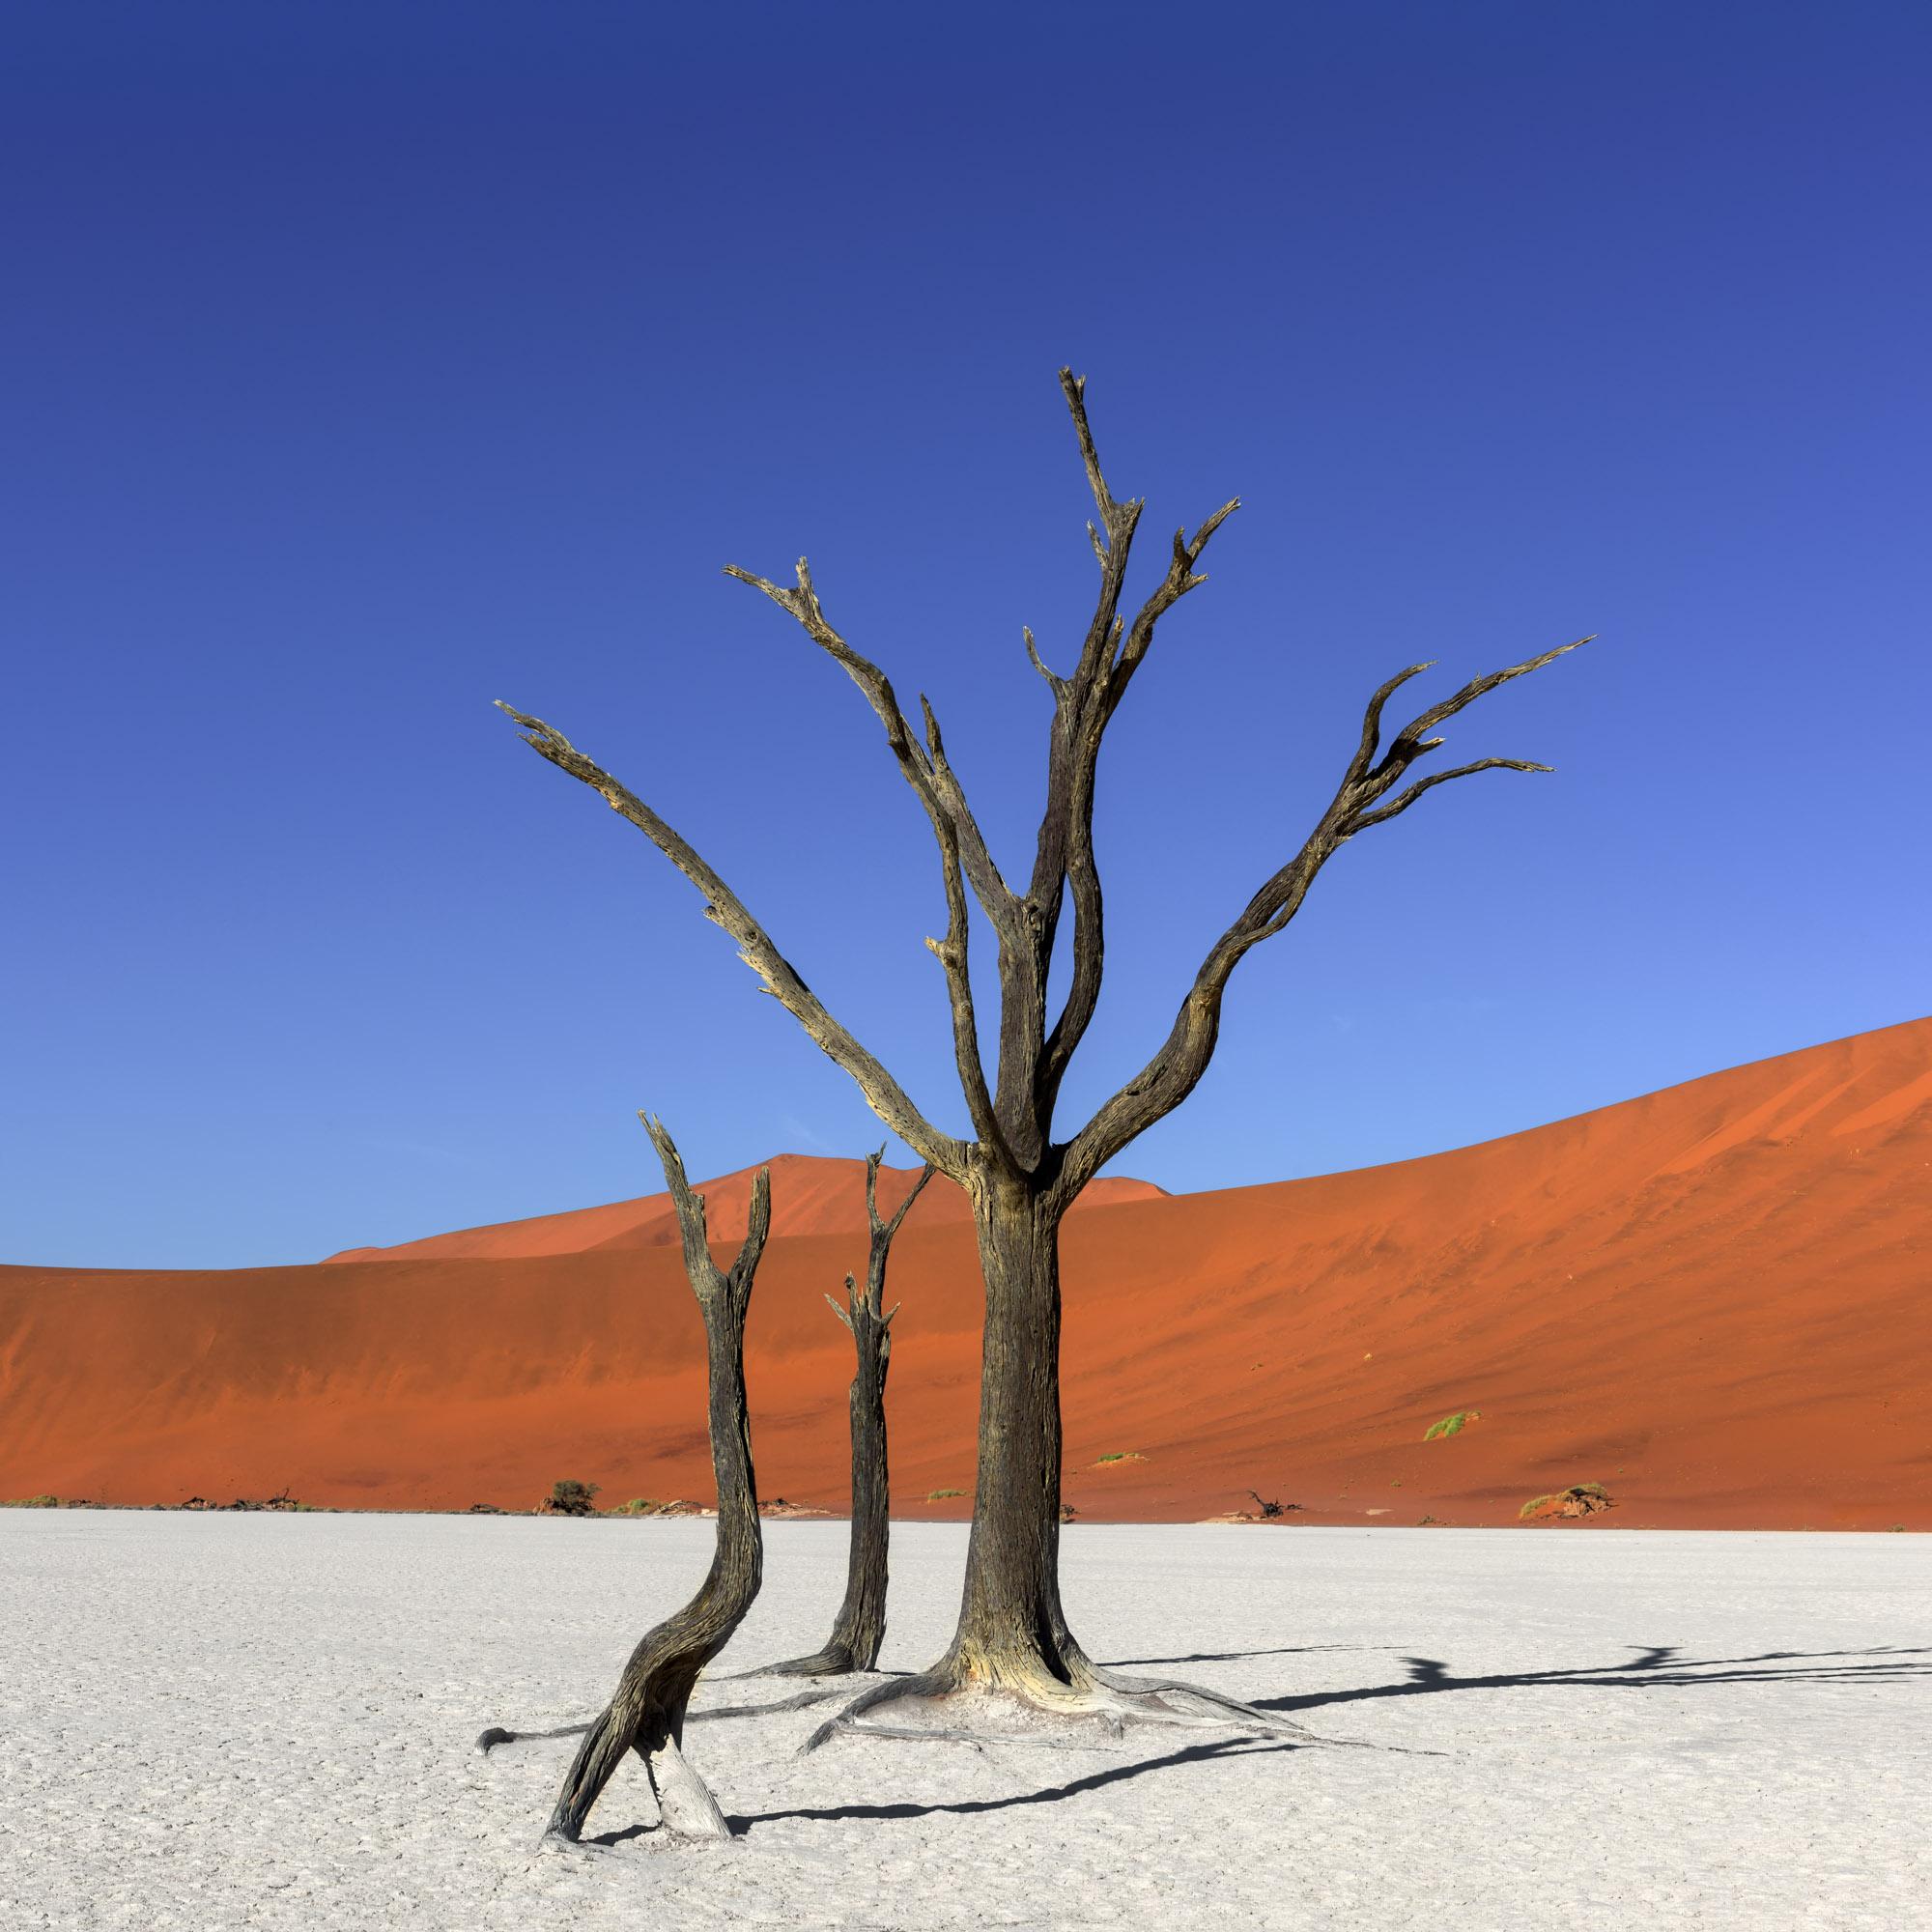 Dead Camelthorn Trees in Deadvlei, Namibia